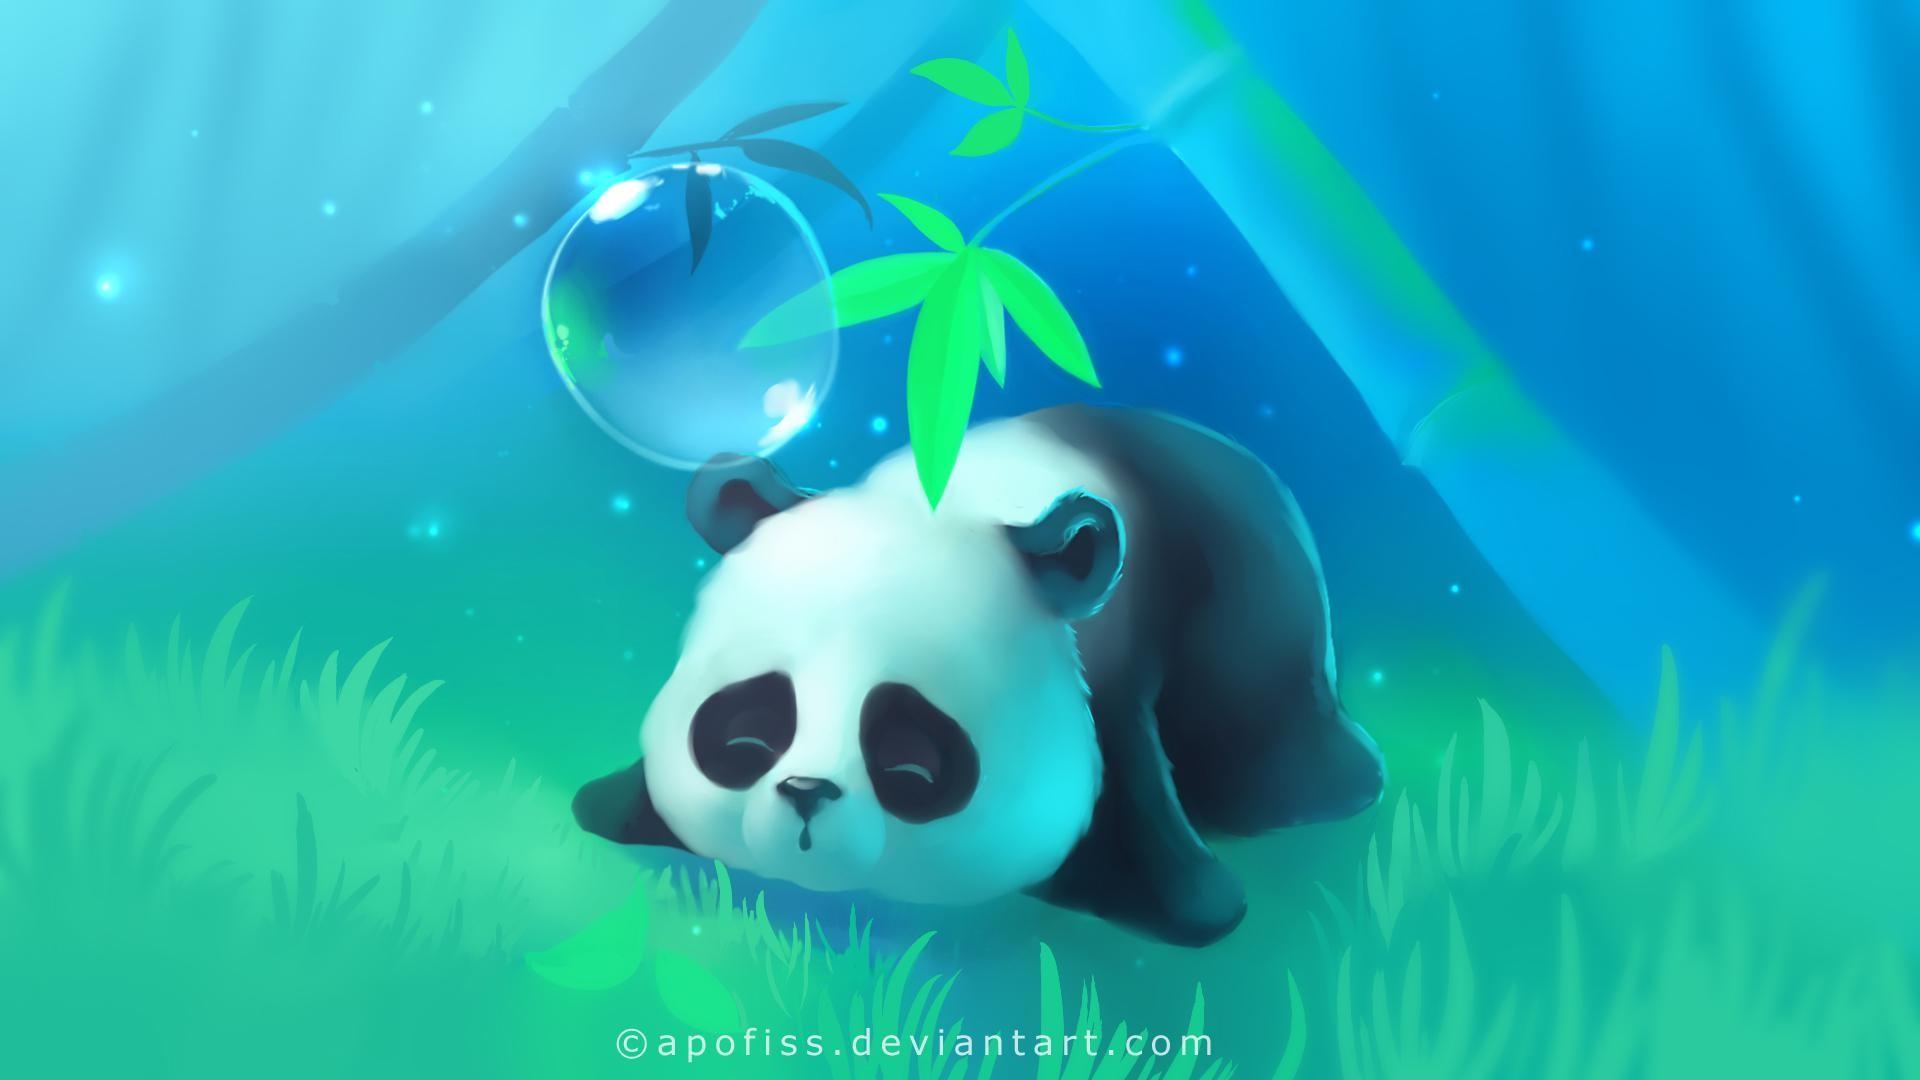 … Panda Anime Full HD Pics Wallpapers 9517   Amazing Wallpaperz